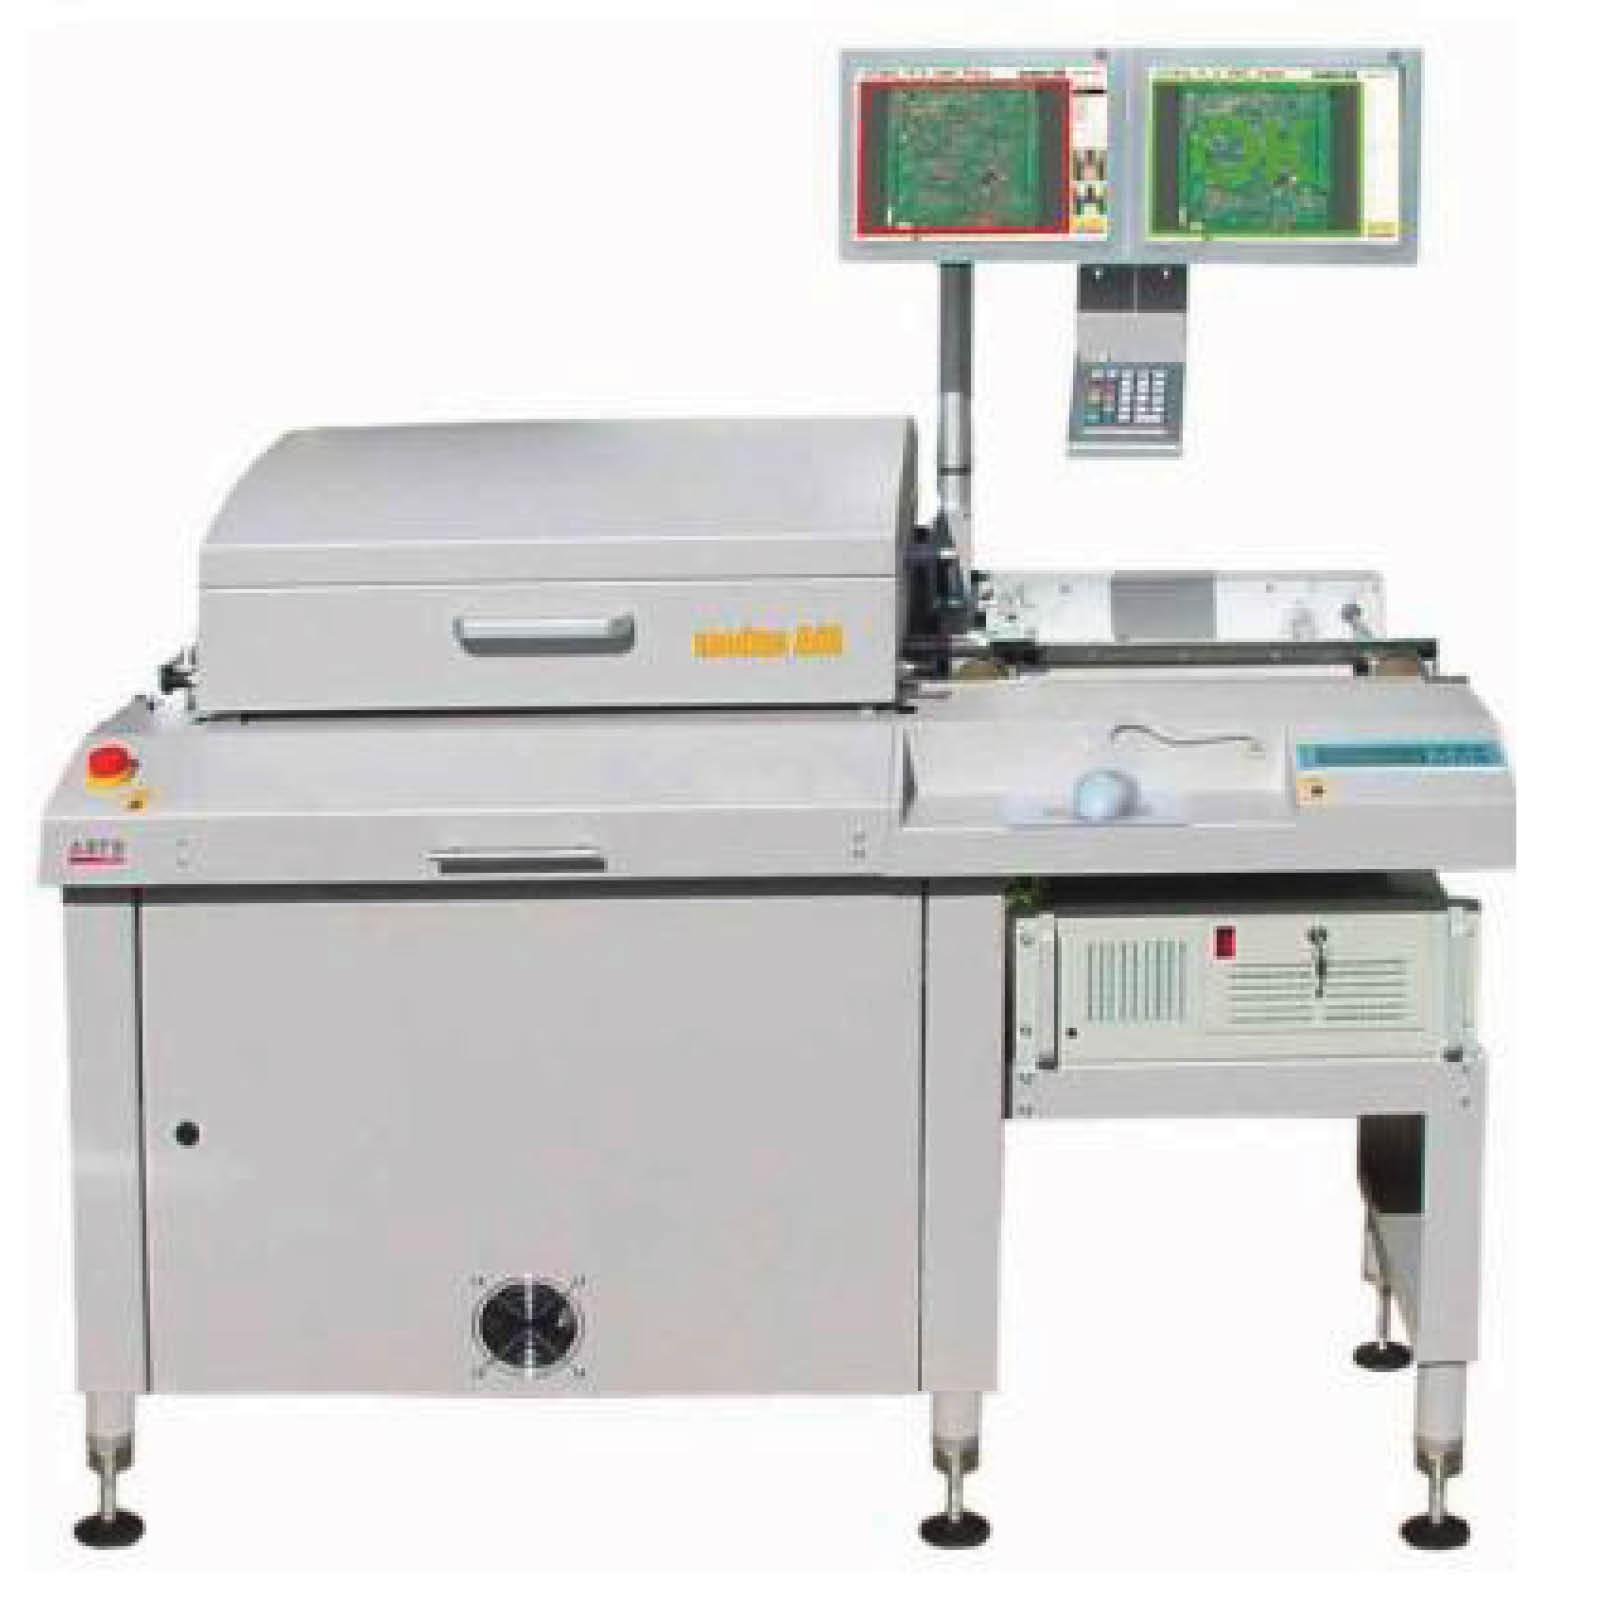 AOI 1200-IDA-UV inspection